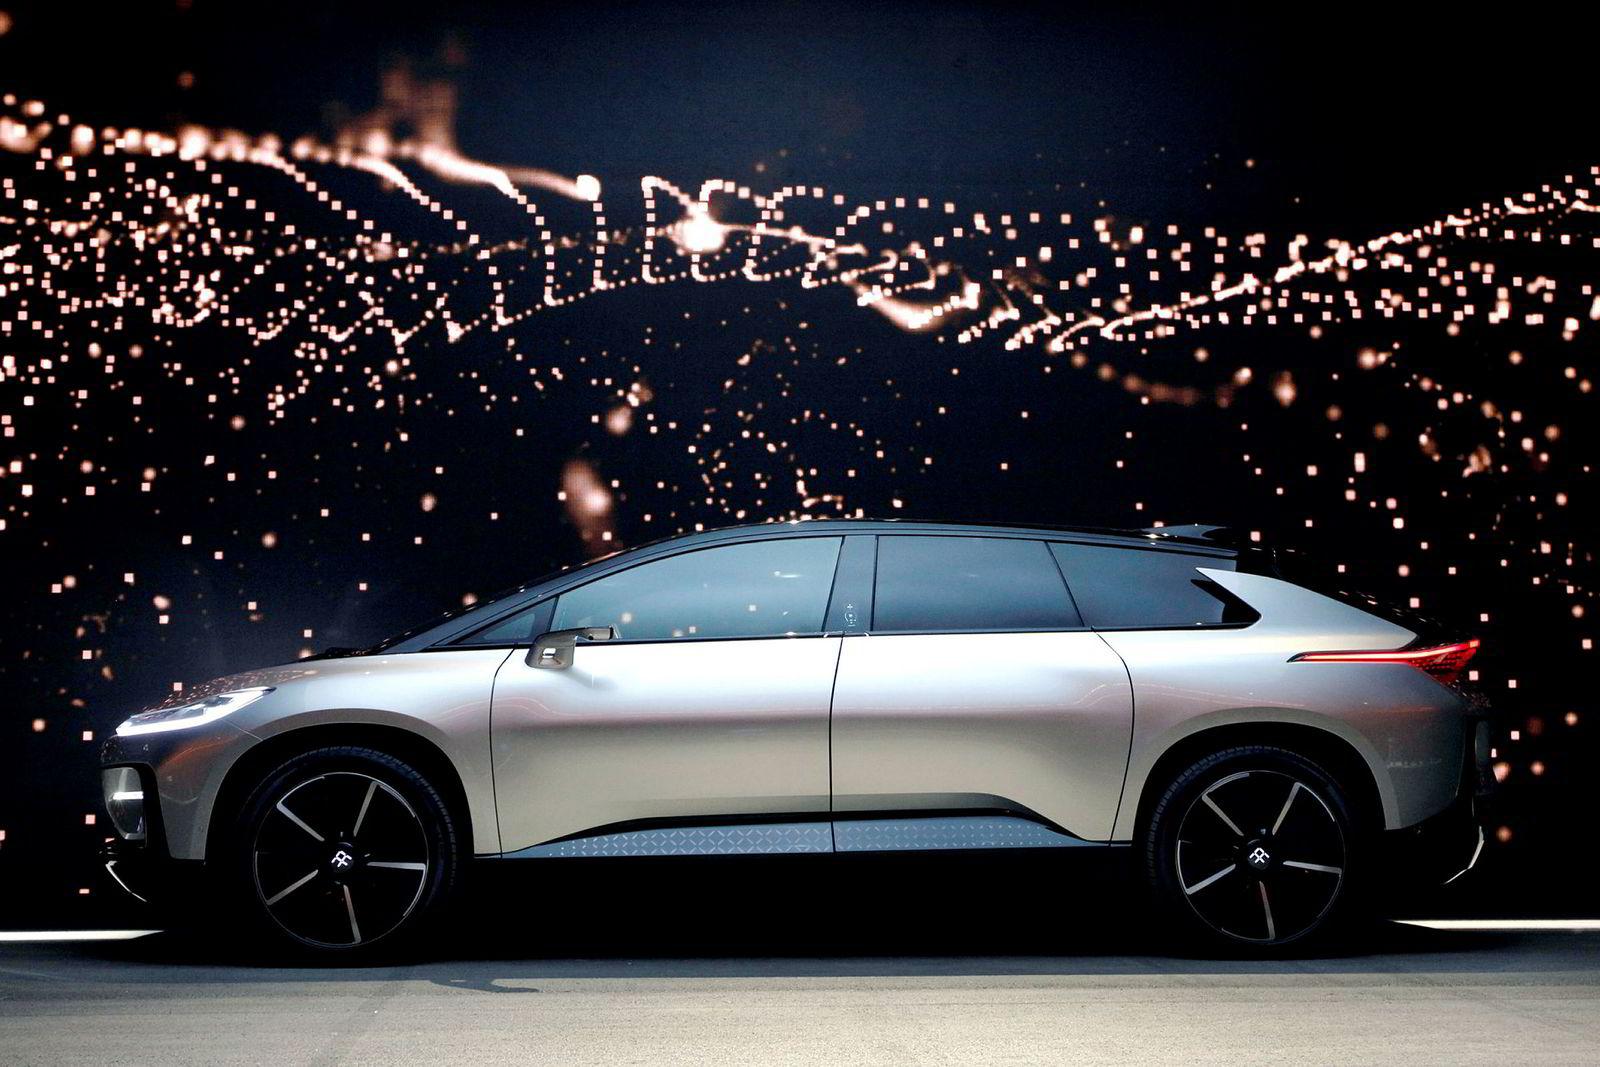 Faraday Future FF 91 er verdens raskeste elektriske bil.